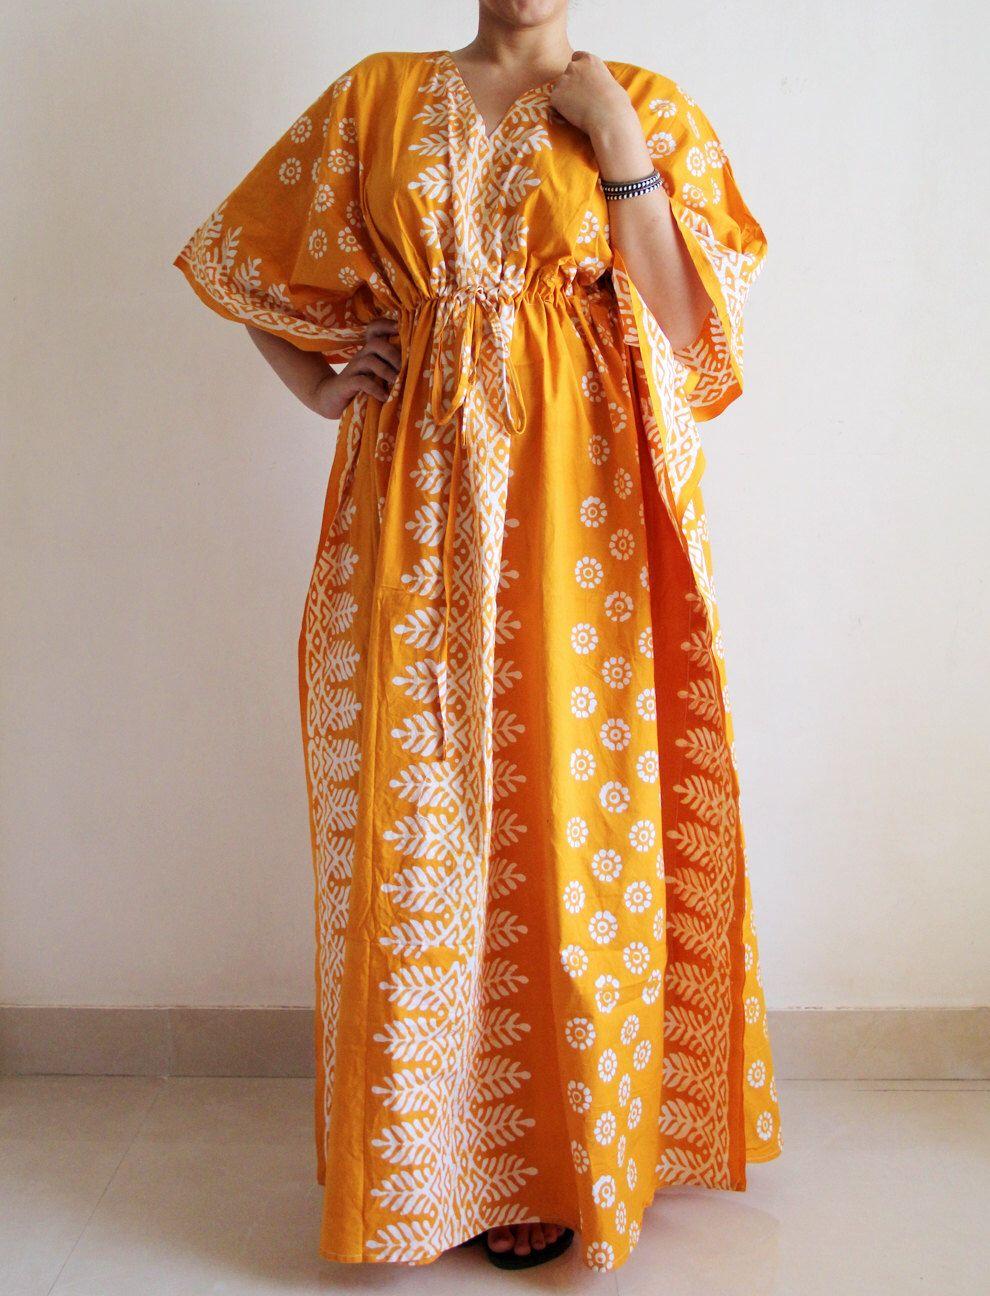 b6f6a927ee016 Indian Cotton Summer Dresses Uk   Saddha